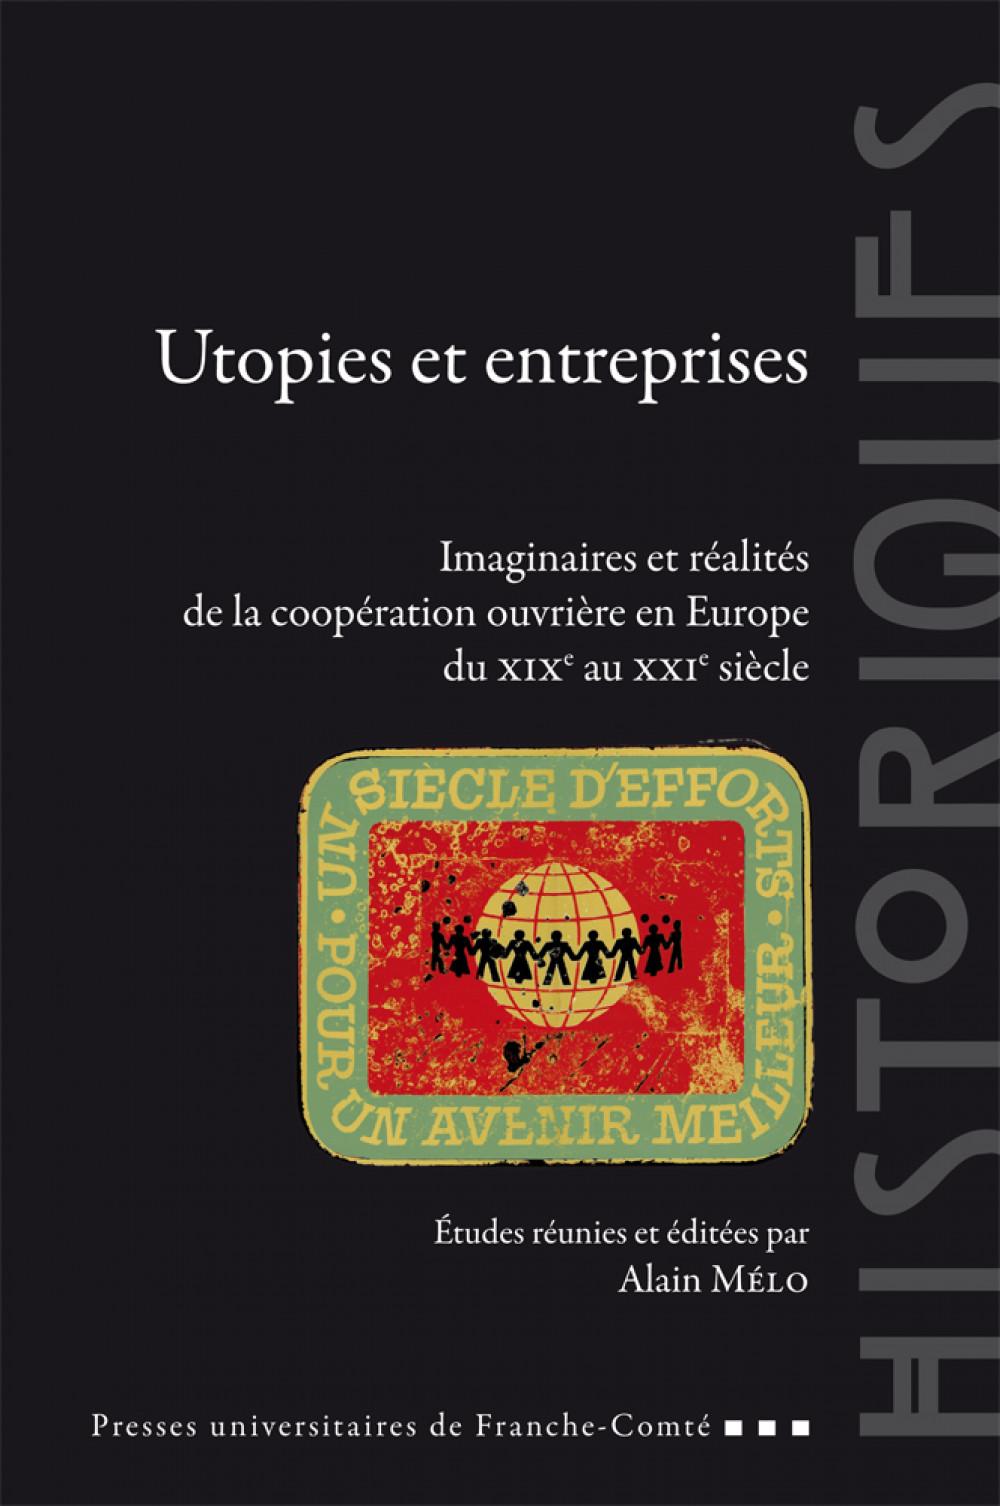 Utopies et entreprises